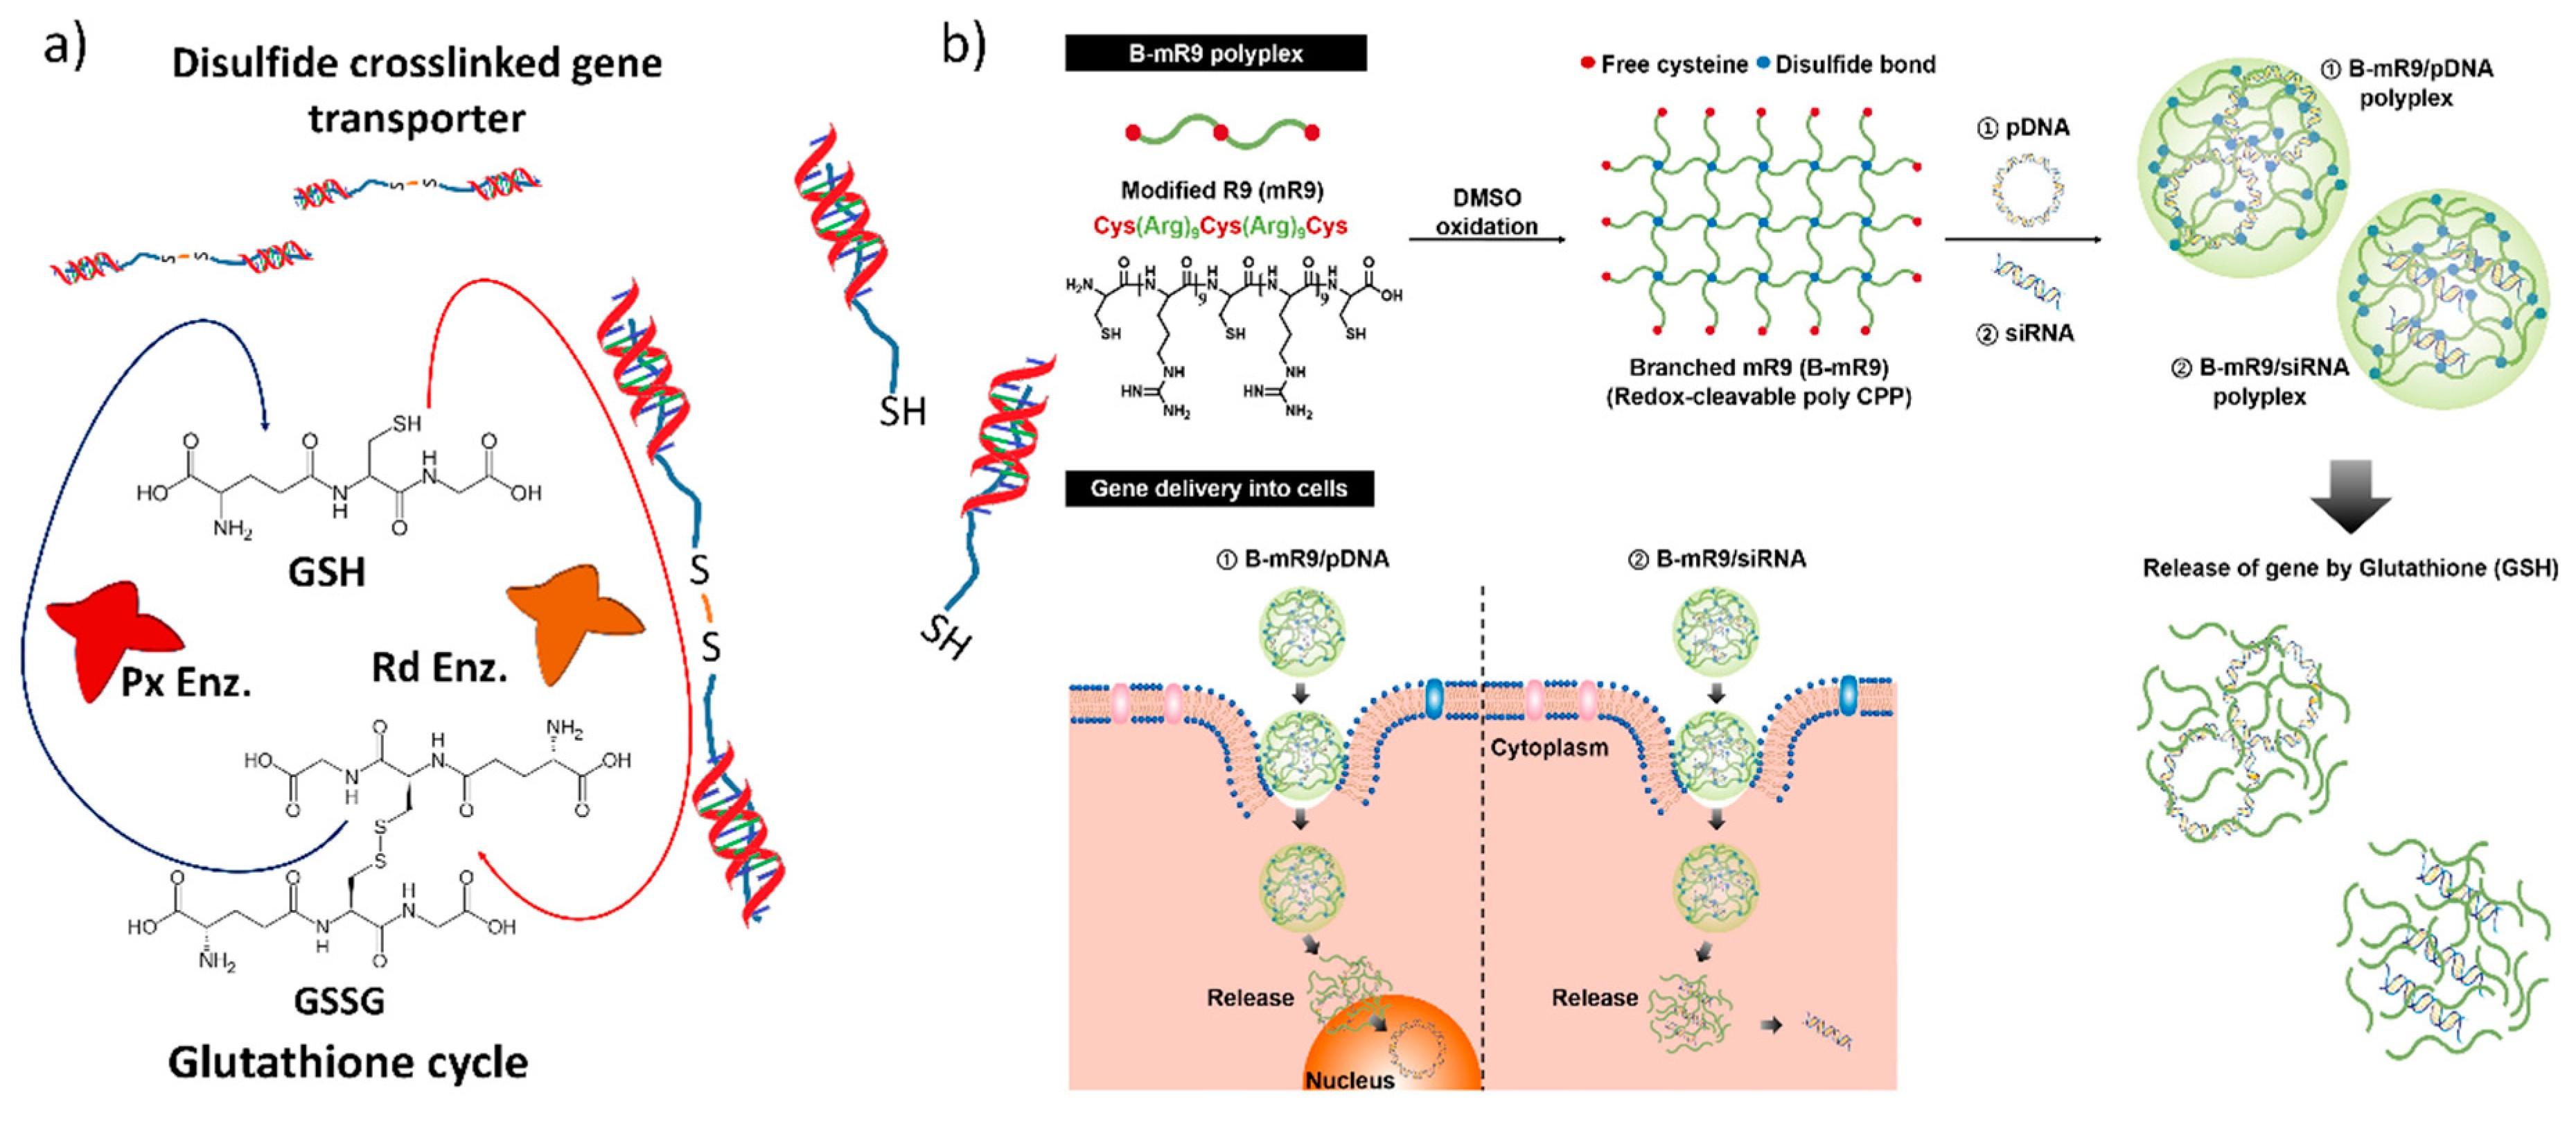 Wiring Diagram for Snorkel S1930 Jlo6251 Nanomaterials Free Full Text Of Wiring Diagram for Snorkel S1930 Jlo6251